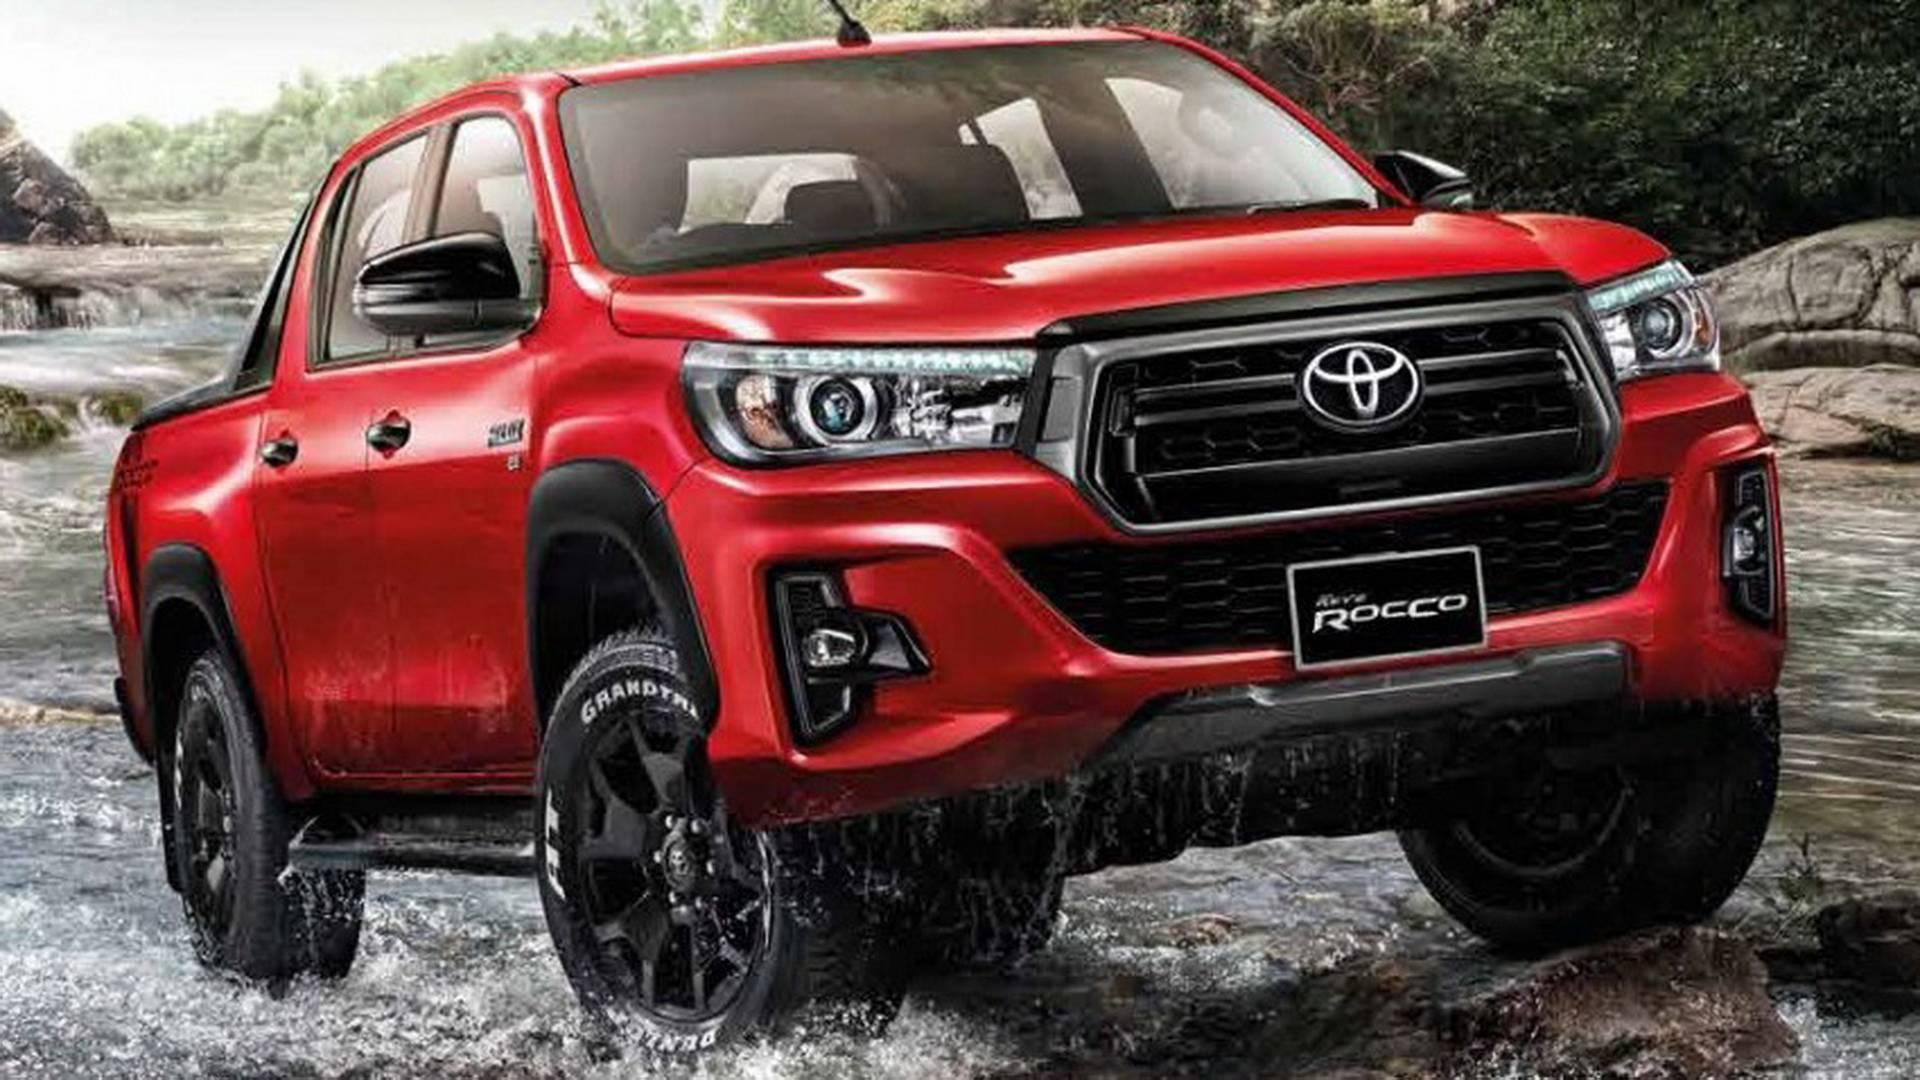 New Toyota Hilux Rocco